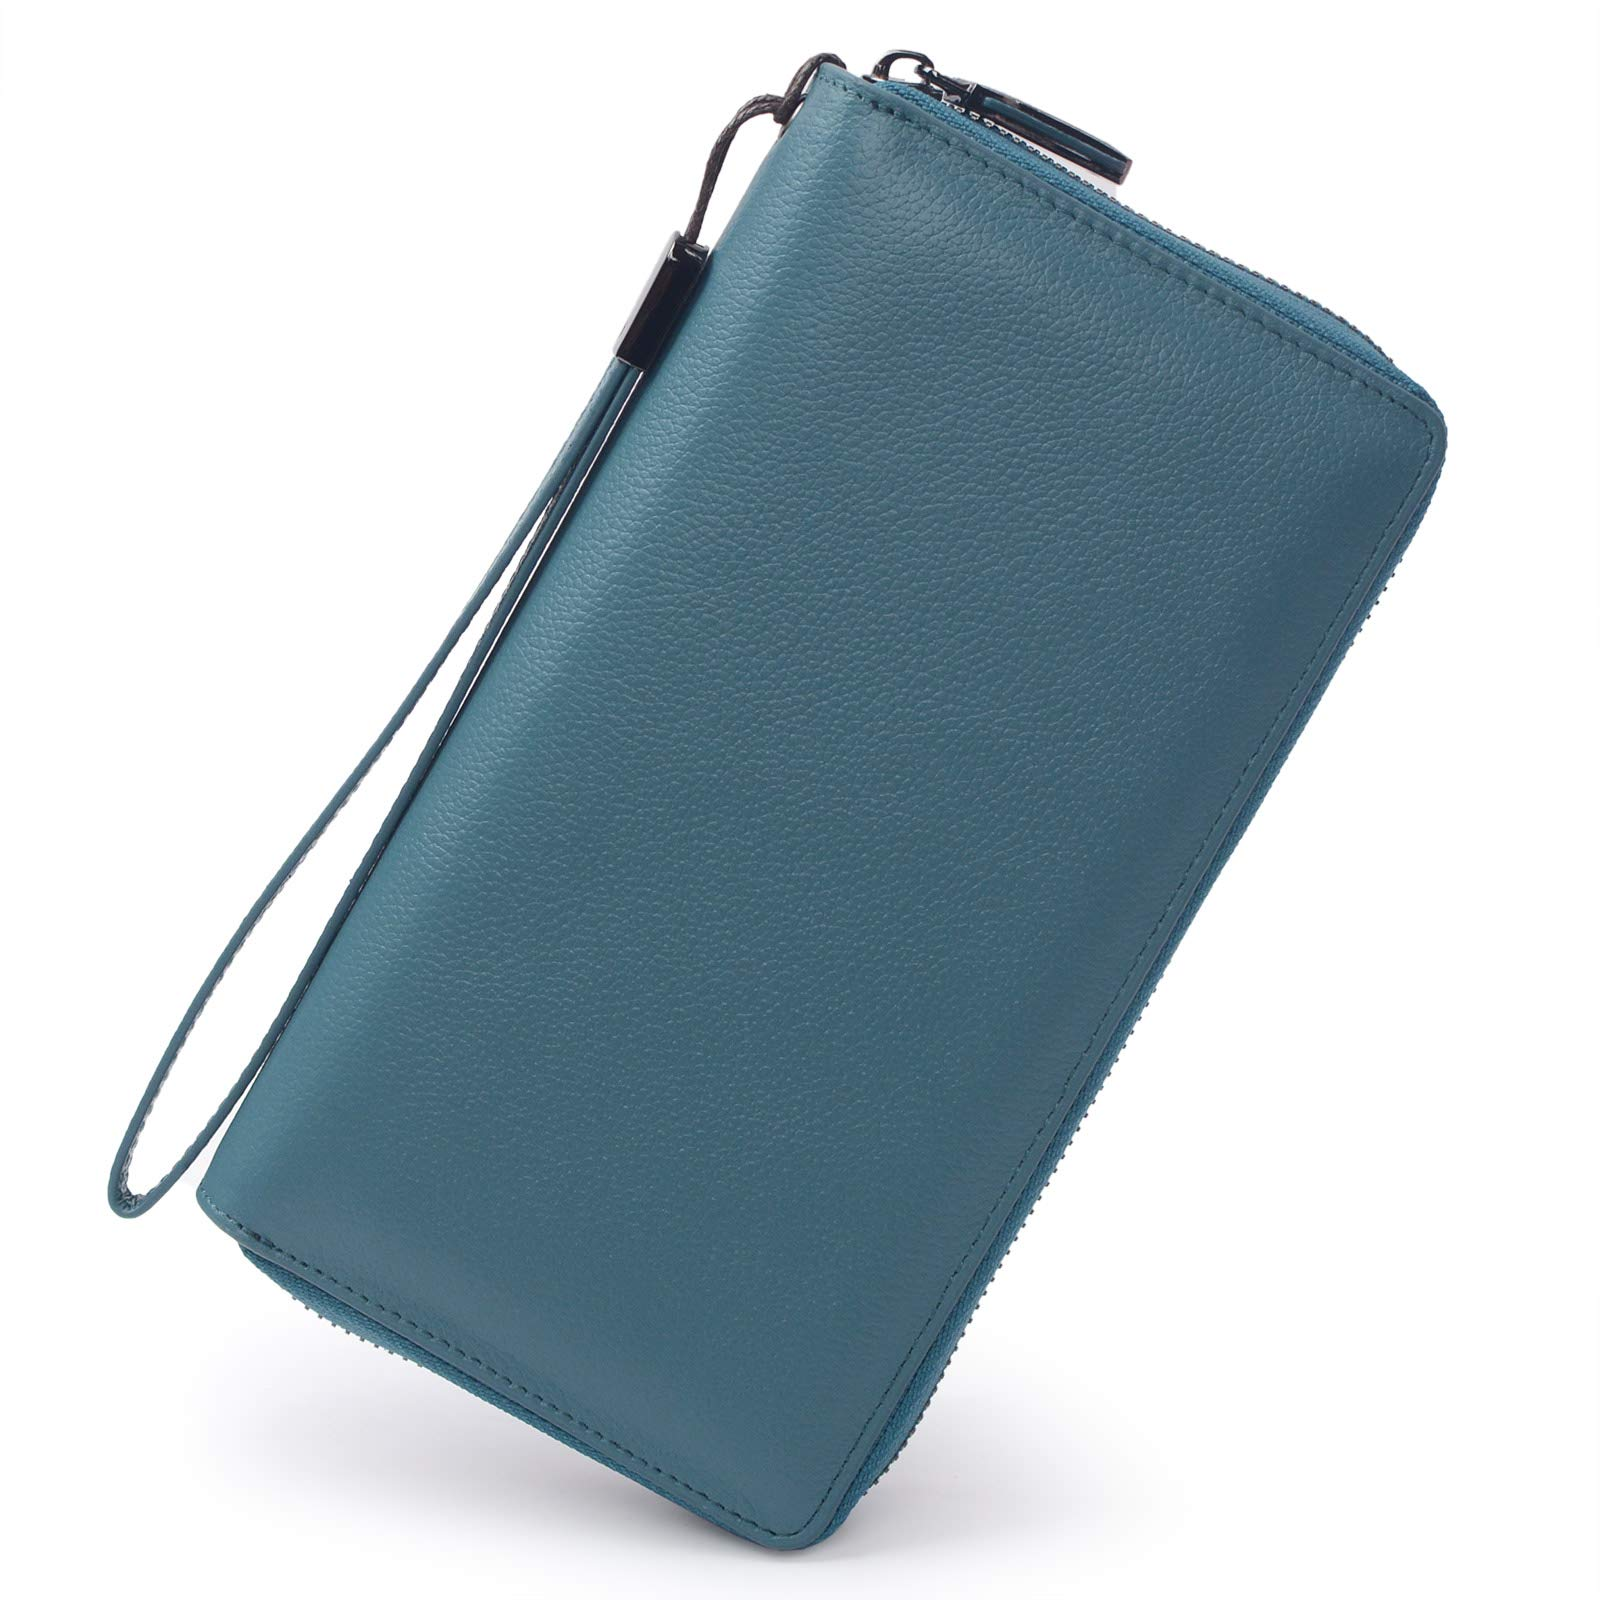 Women RFID Blocking Wallet Leather Zip Around Phone Clutch Large Travel Purse Wristlet (Lake Blue)